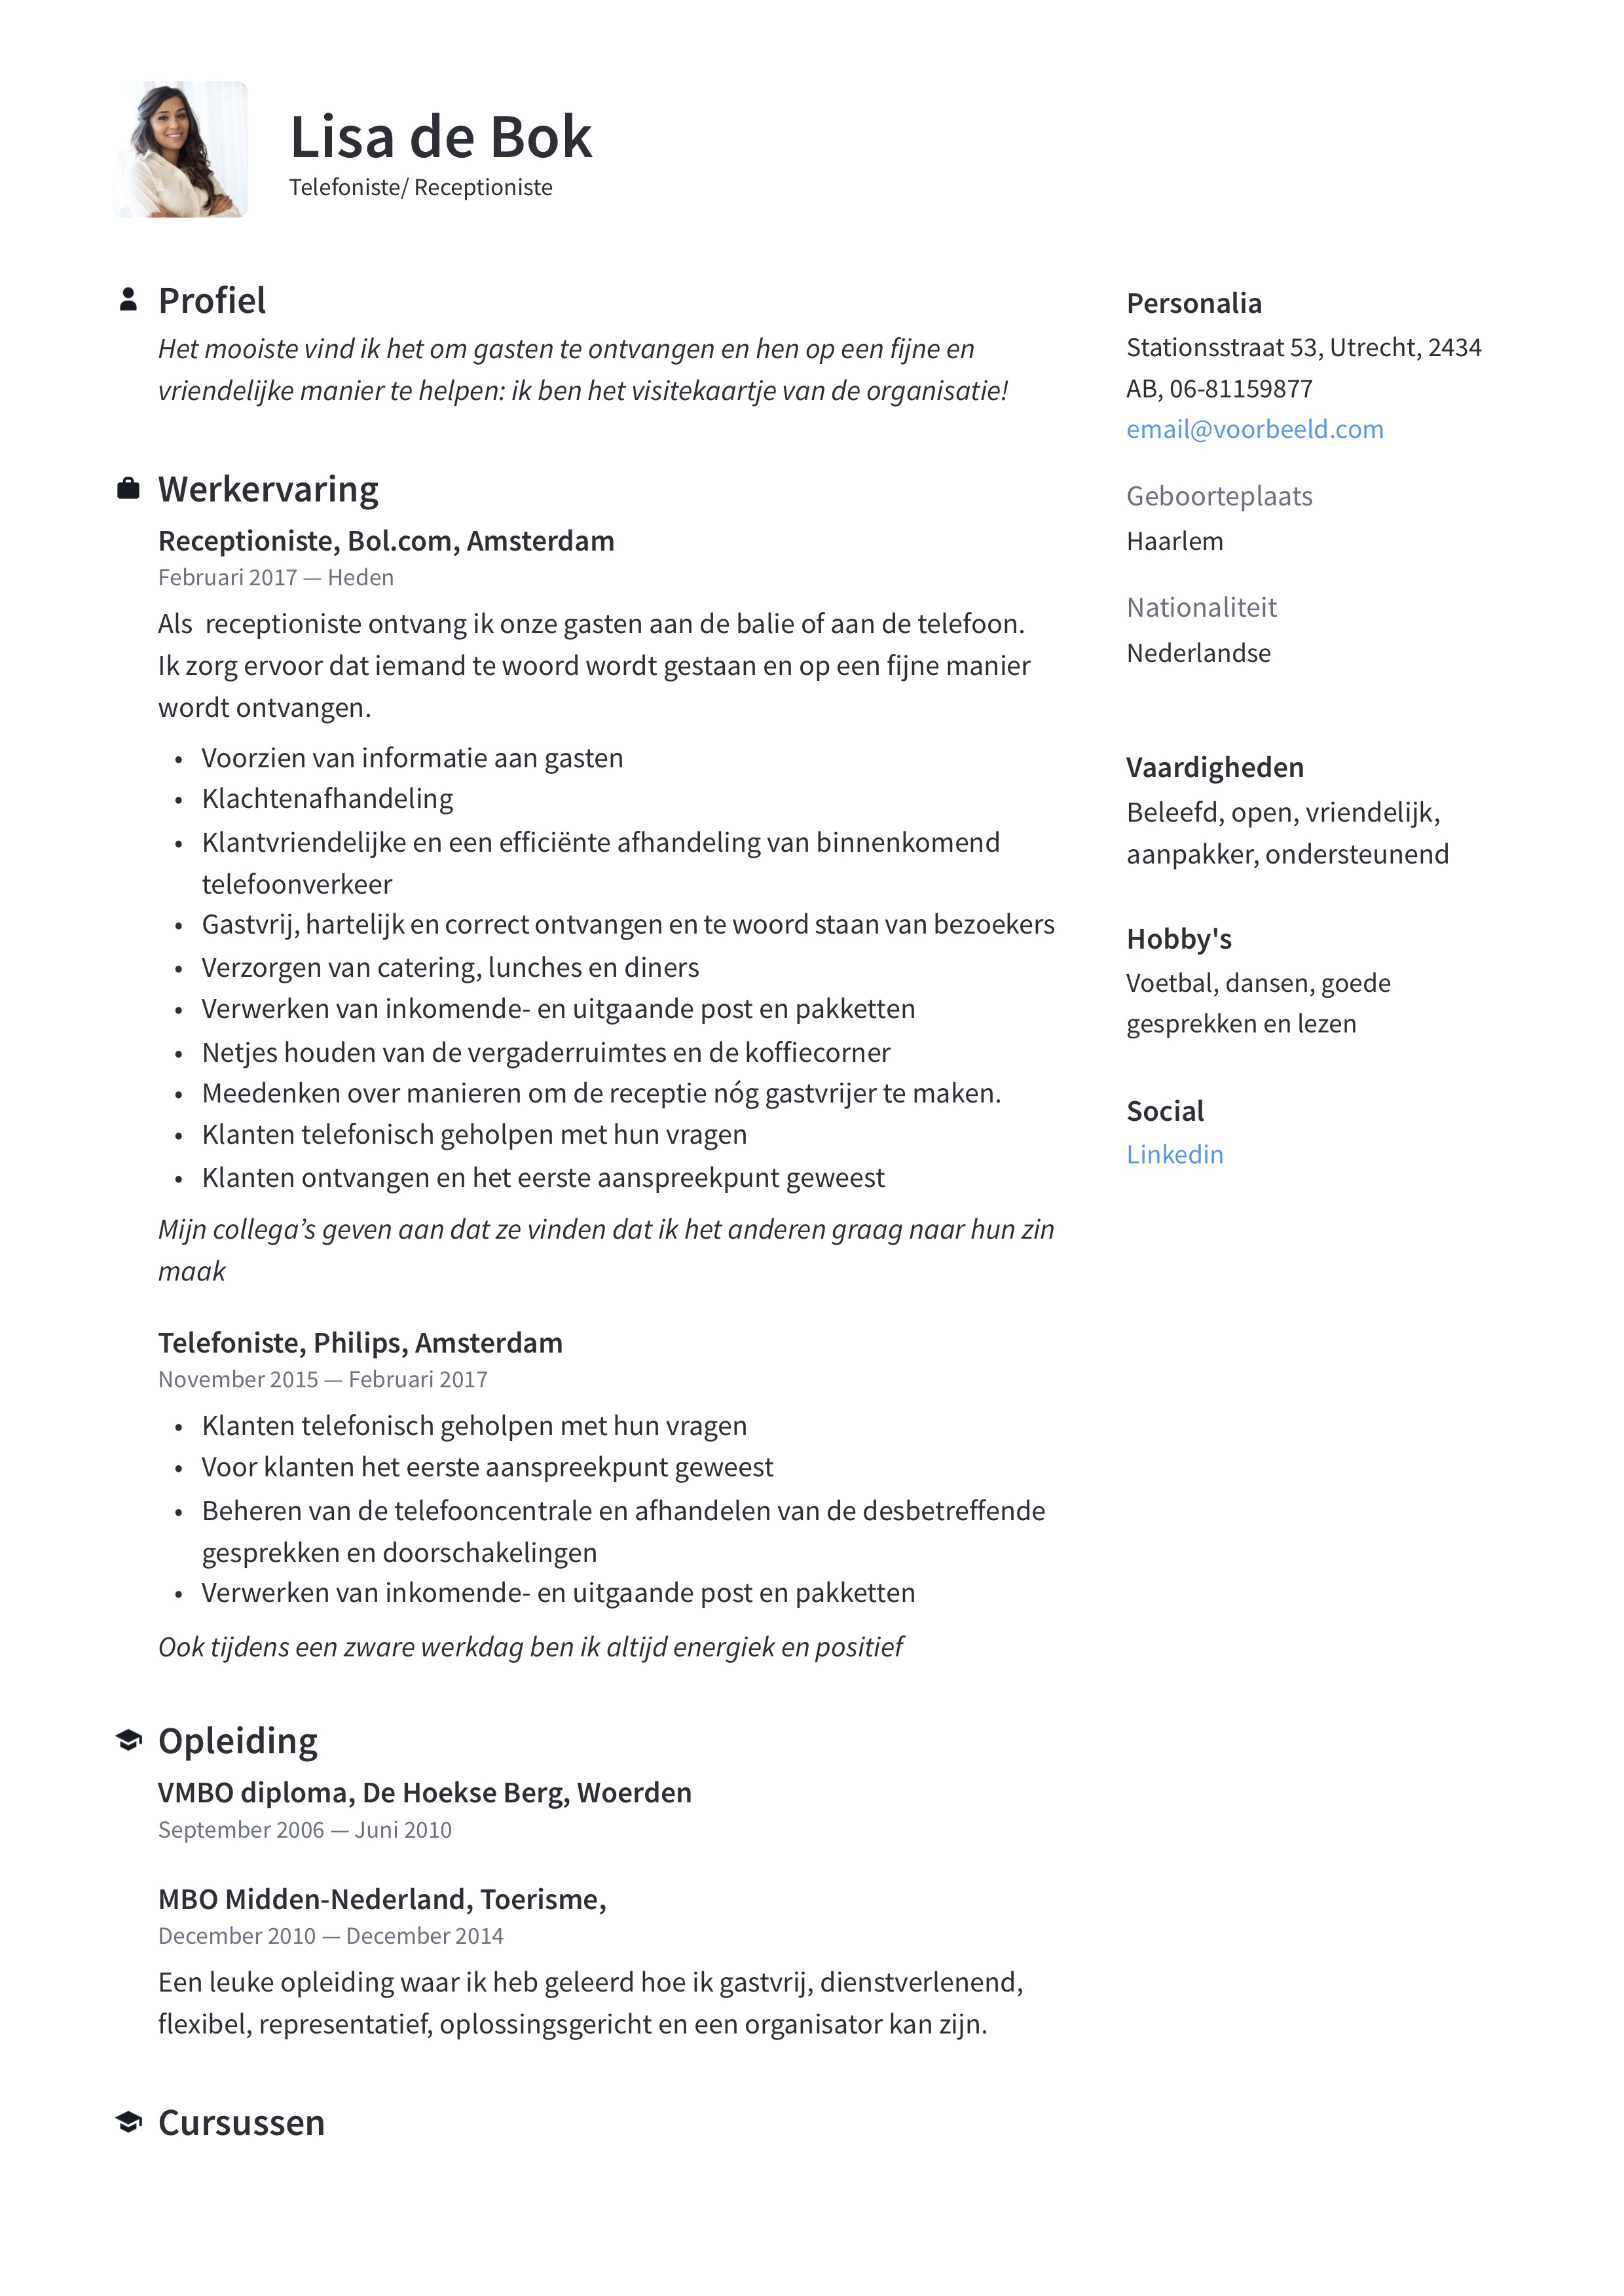 Telefoniste/Receptioniste CV Voorbeeld